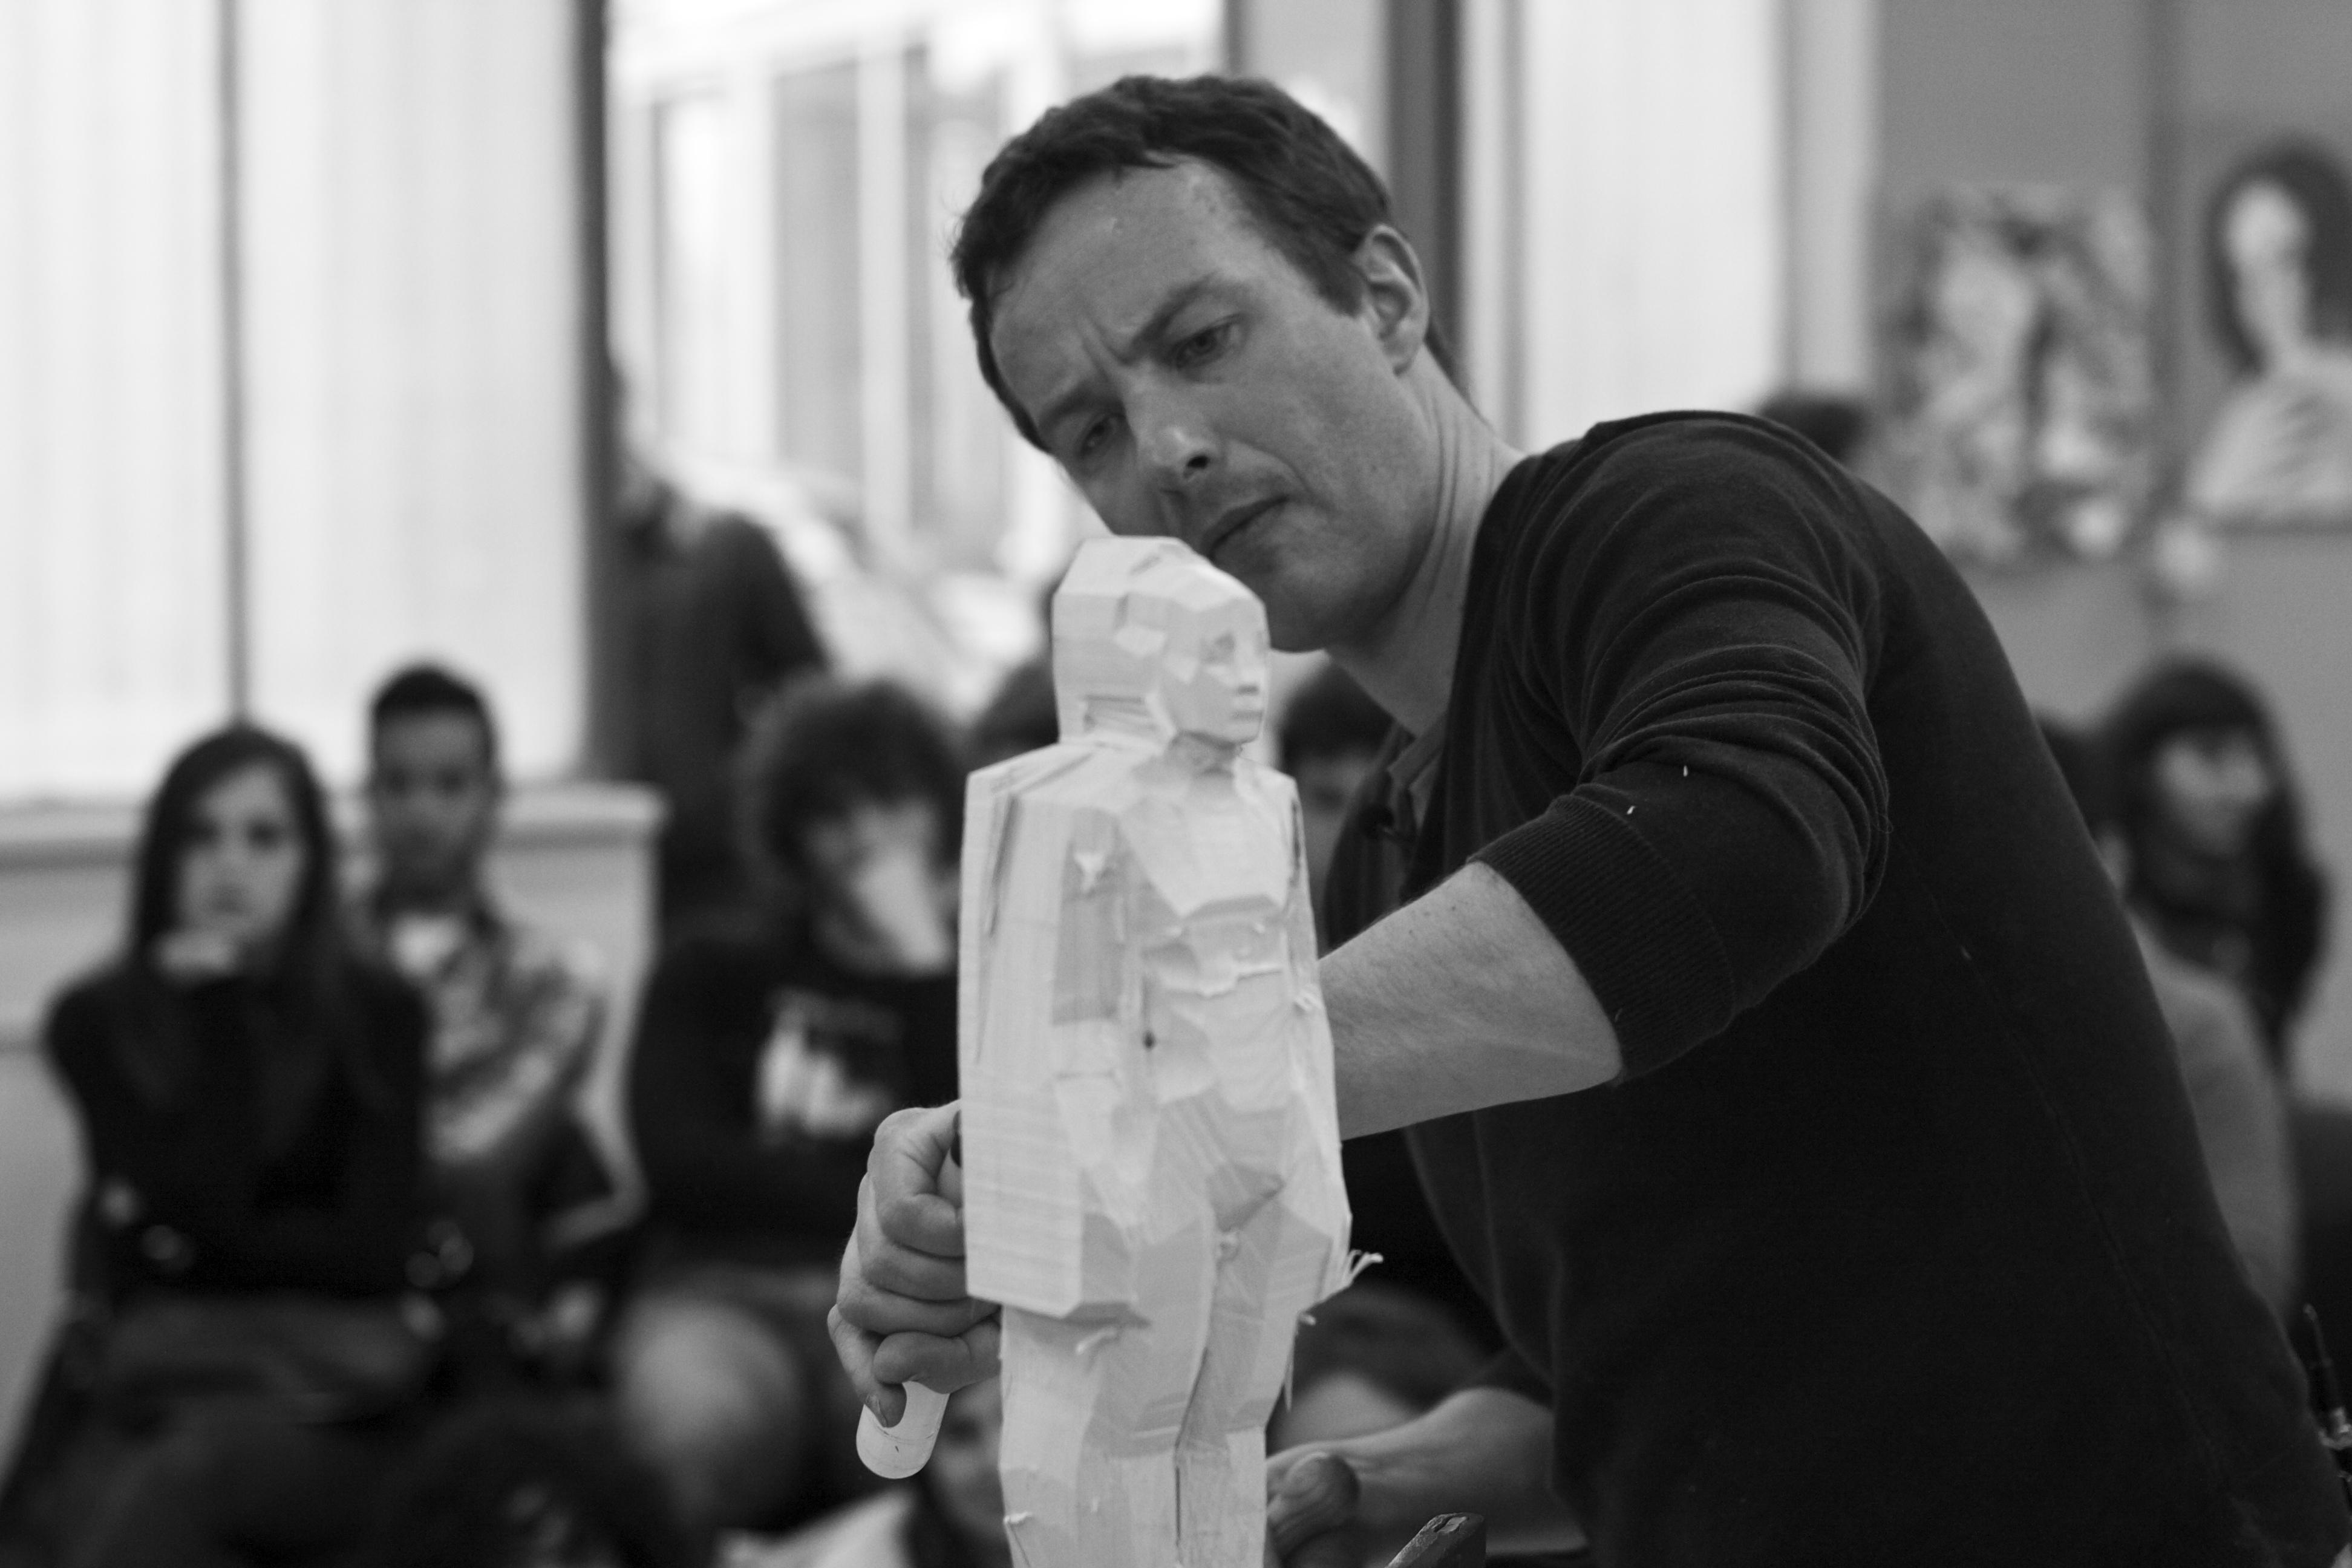 Flickr - Aron Demetz - Dialoghi e materia - Workshop a cura di Franco Reina77